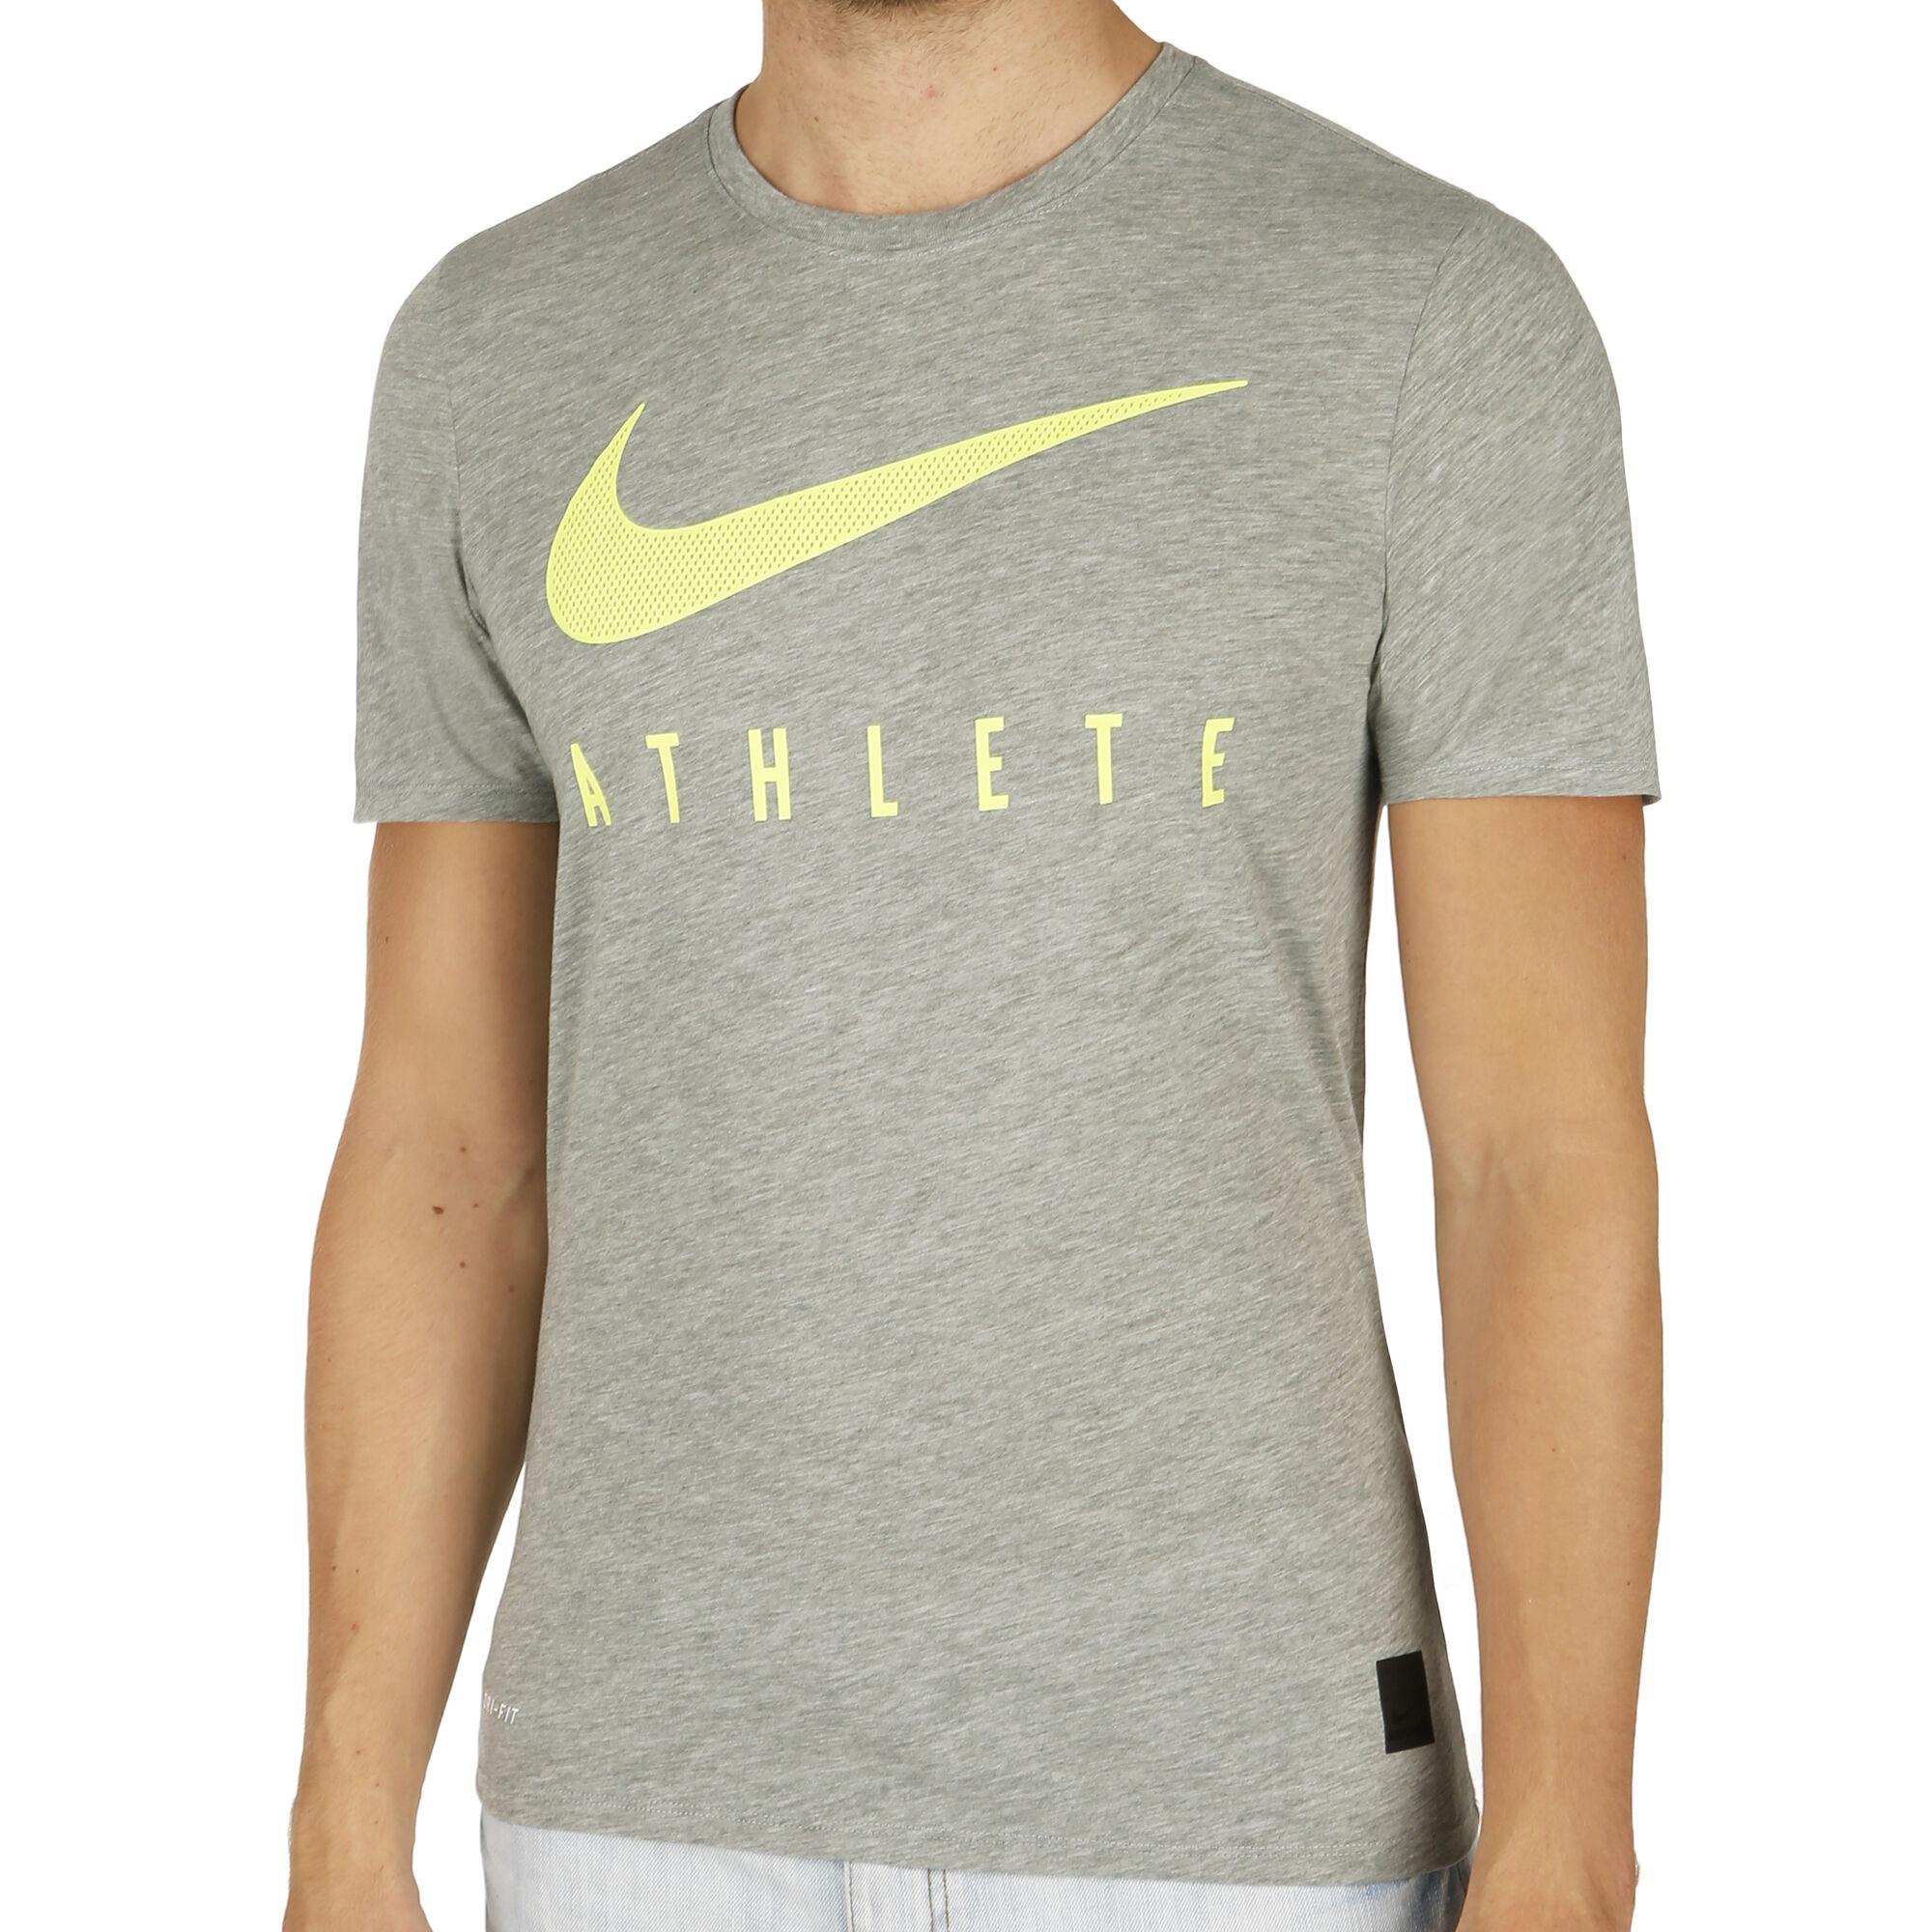 2b4a1c0499852 Nike; Nike; Nike; Nike; Nike; Nike; Nike. Dri-Blend Mesh Swoosh Athlete  Training T-Shirt Men ...